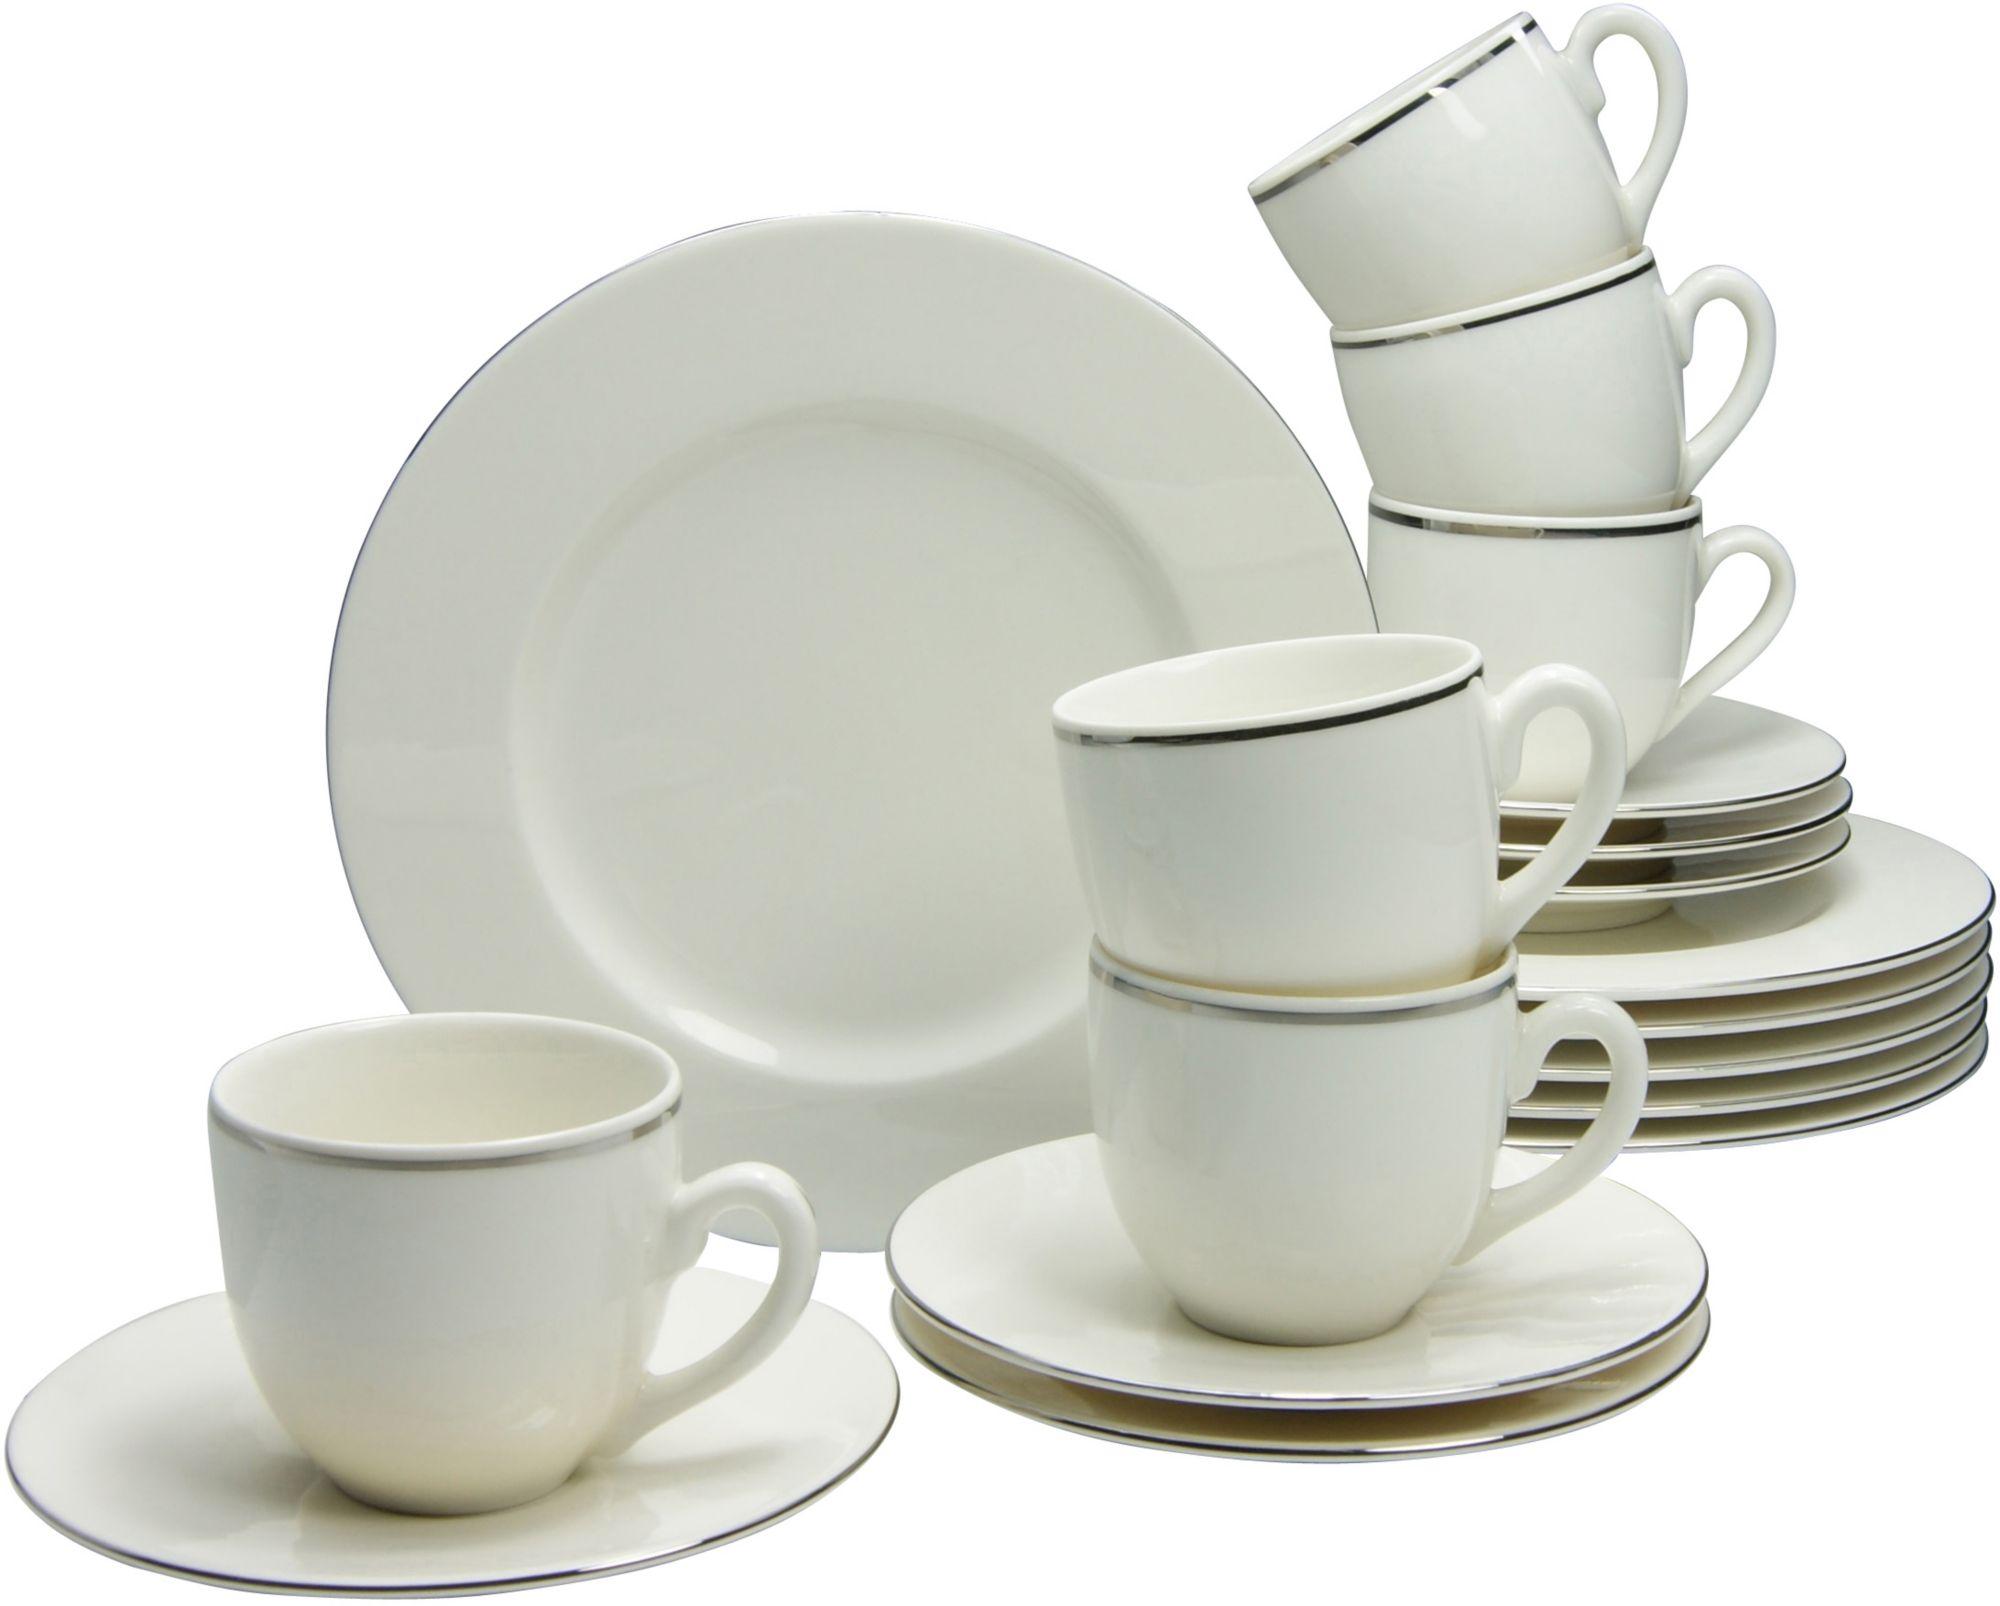 CREATABLE CreaTable Kaffeeservice, Premium-Porzellan, 18 Teile, »VERA«